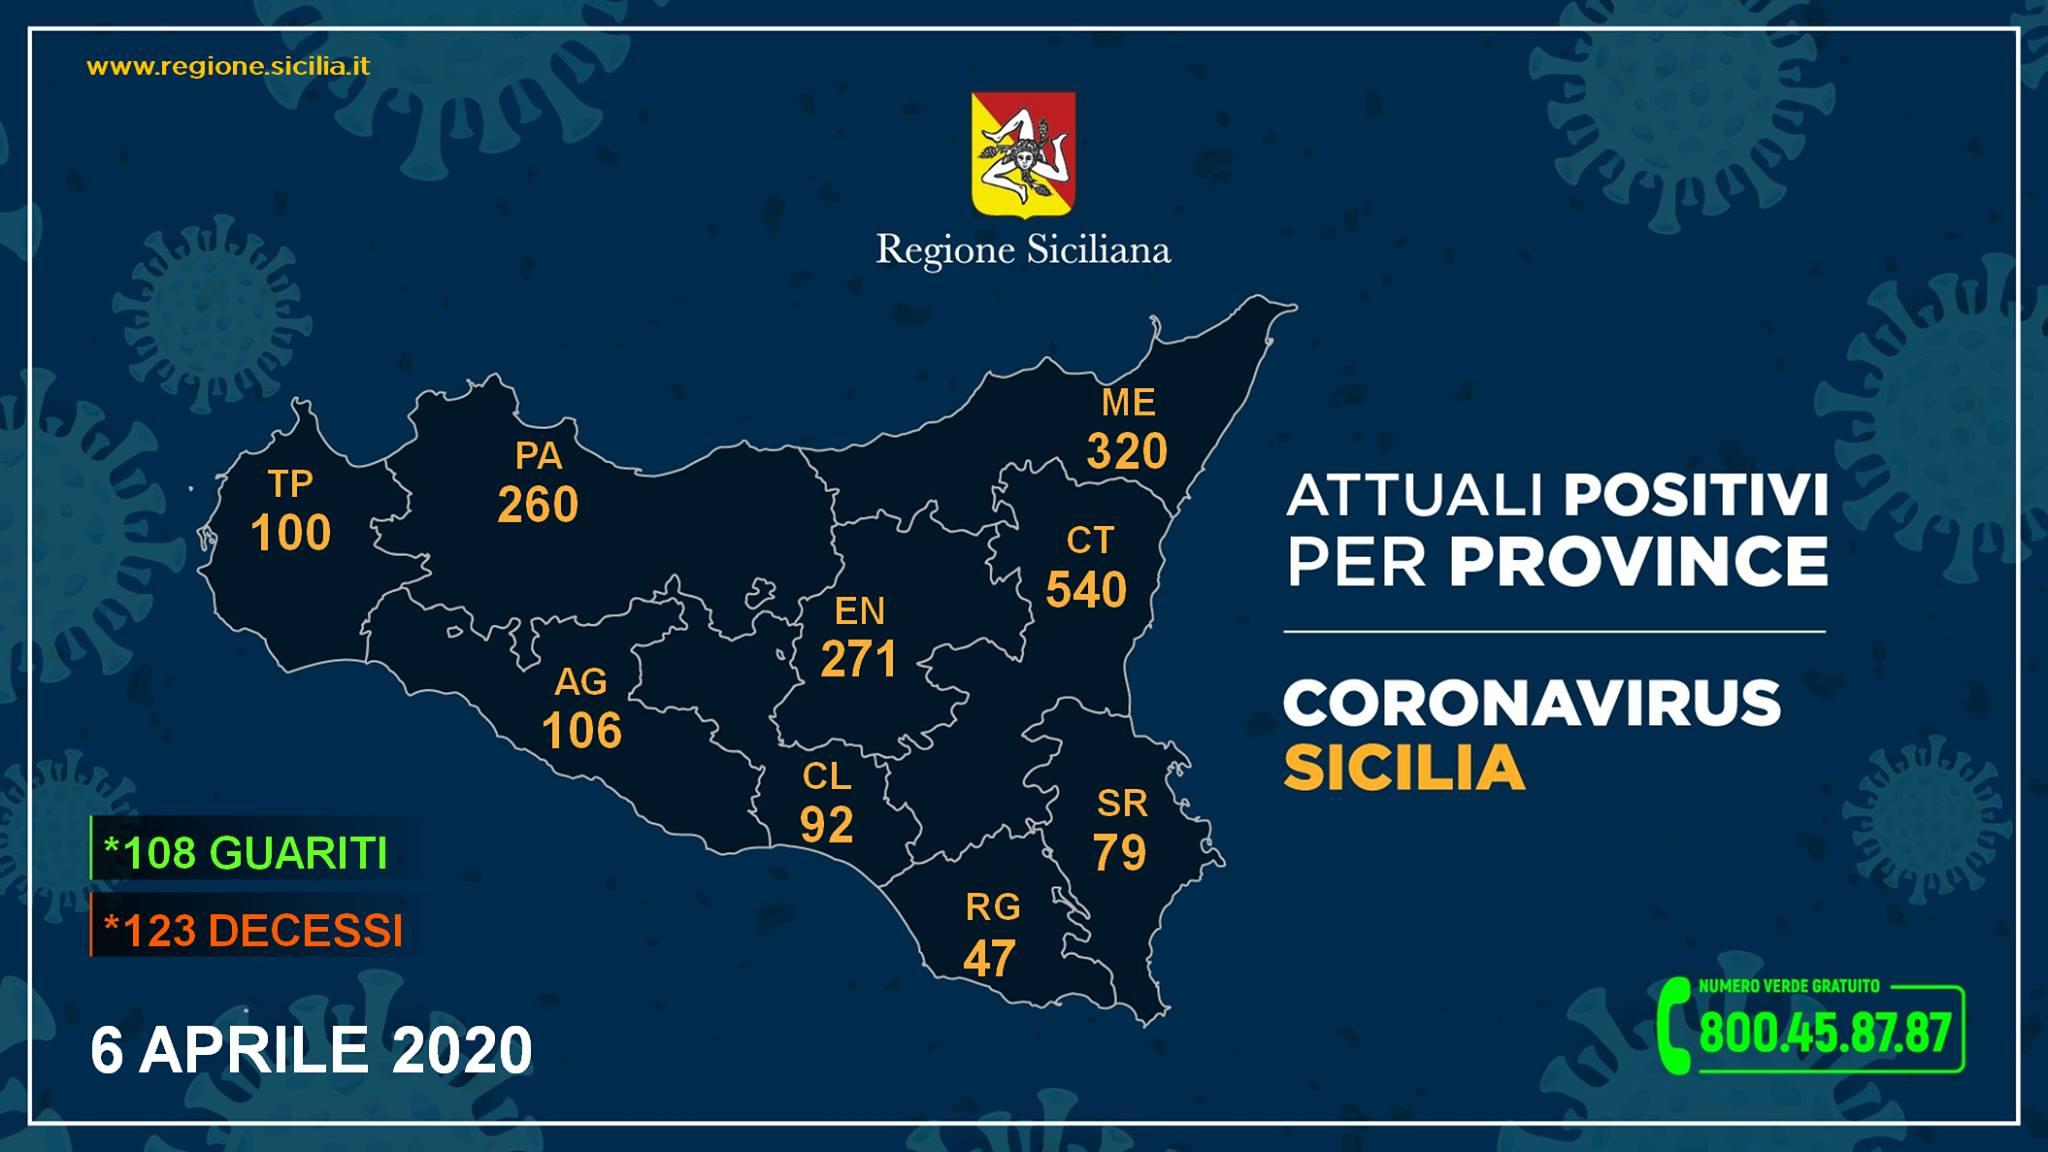 Coronavirus in Sicilia. 6 aprile 2020.